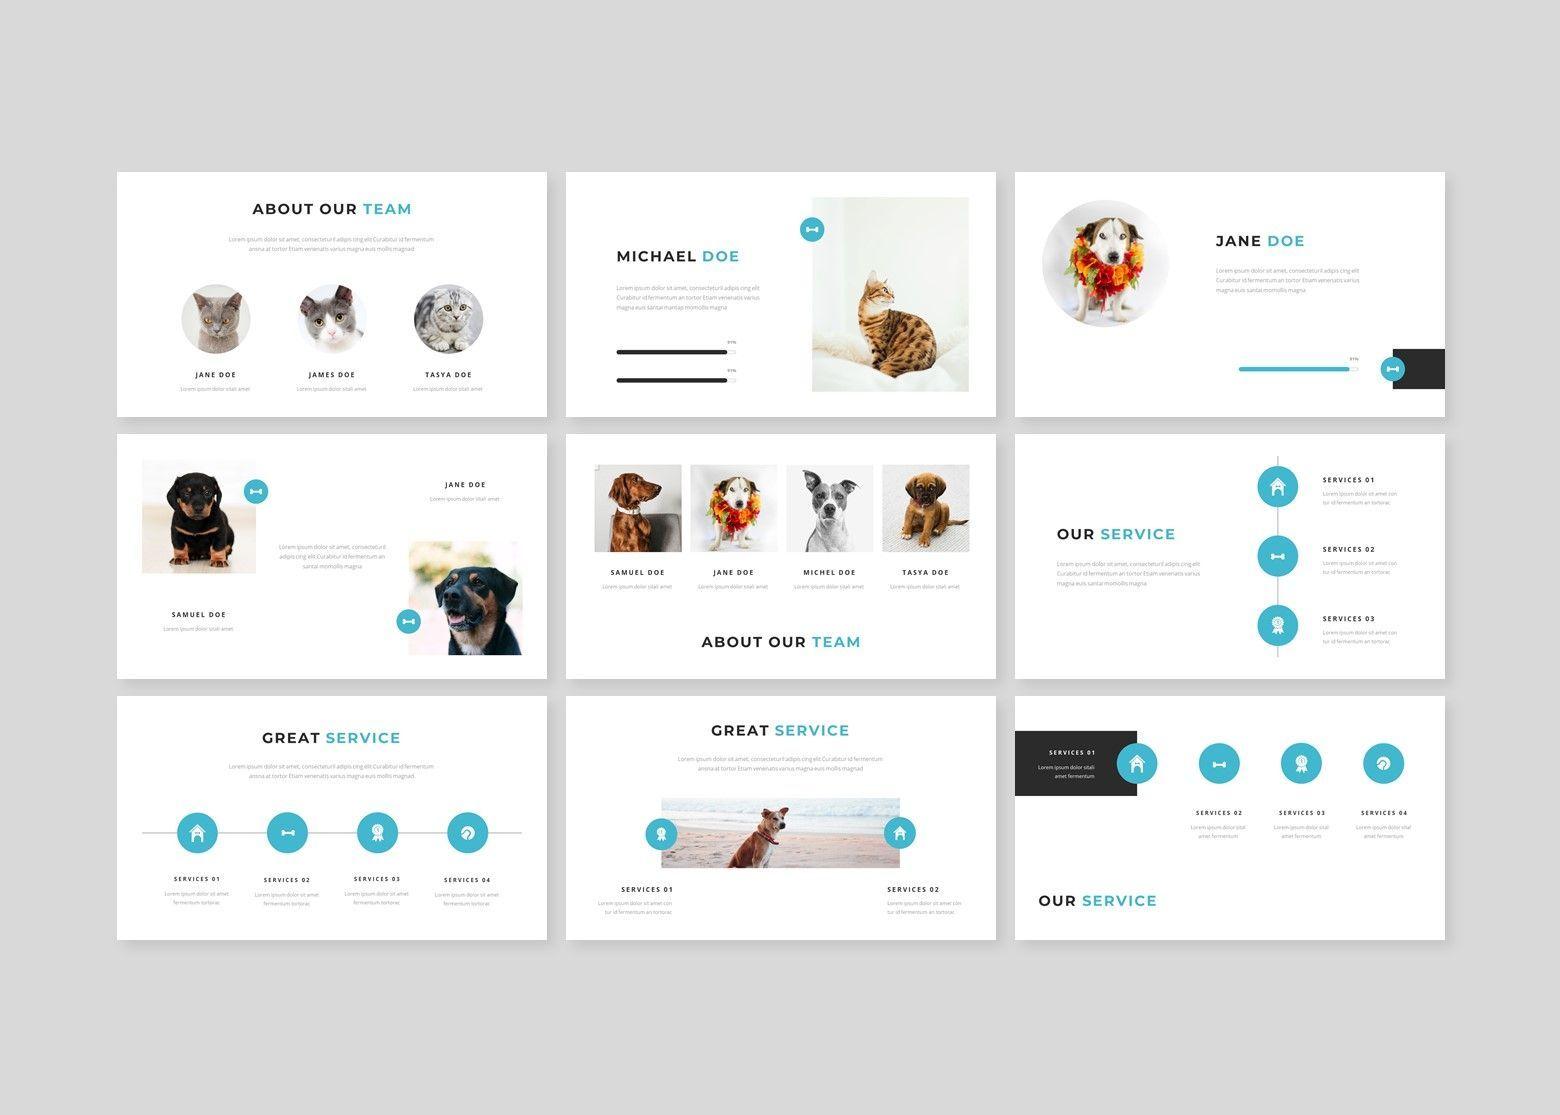 Wrog A Pet Service Keynote Presentation Template, Slide 3, 08155, Business Models — PoweredTemplate.com